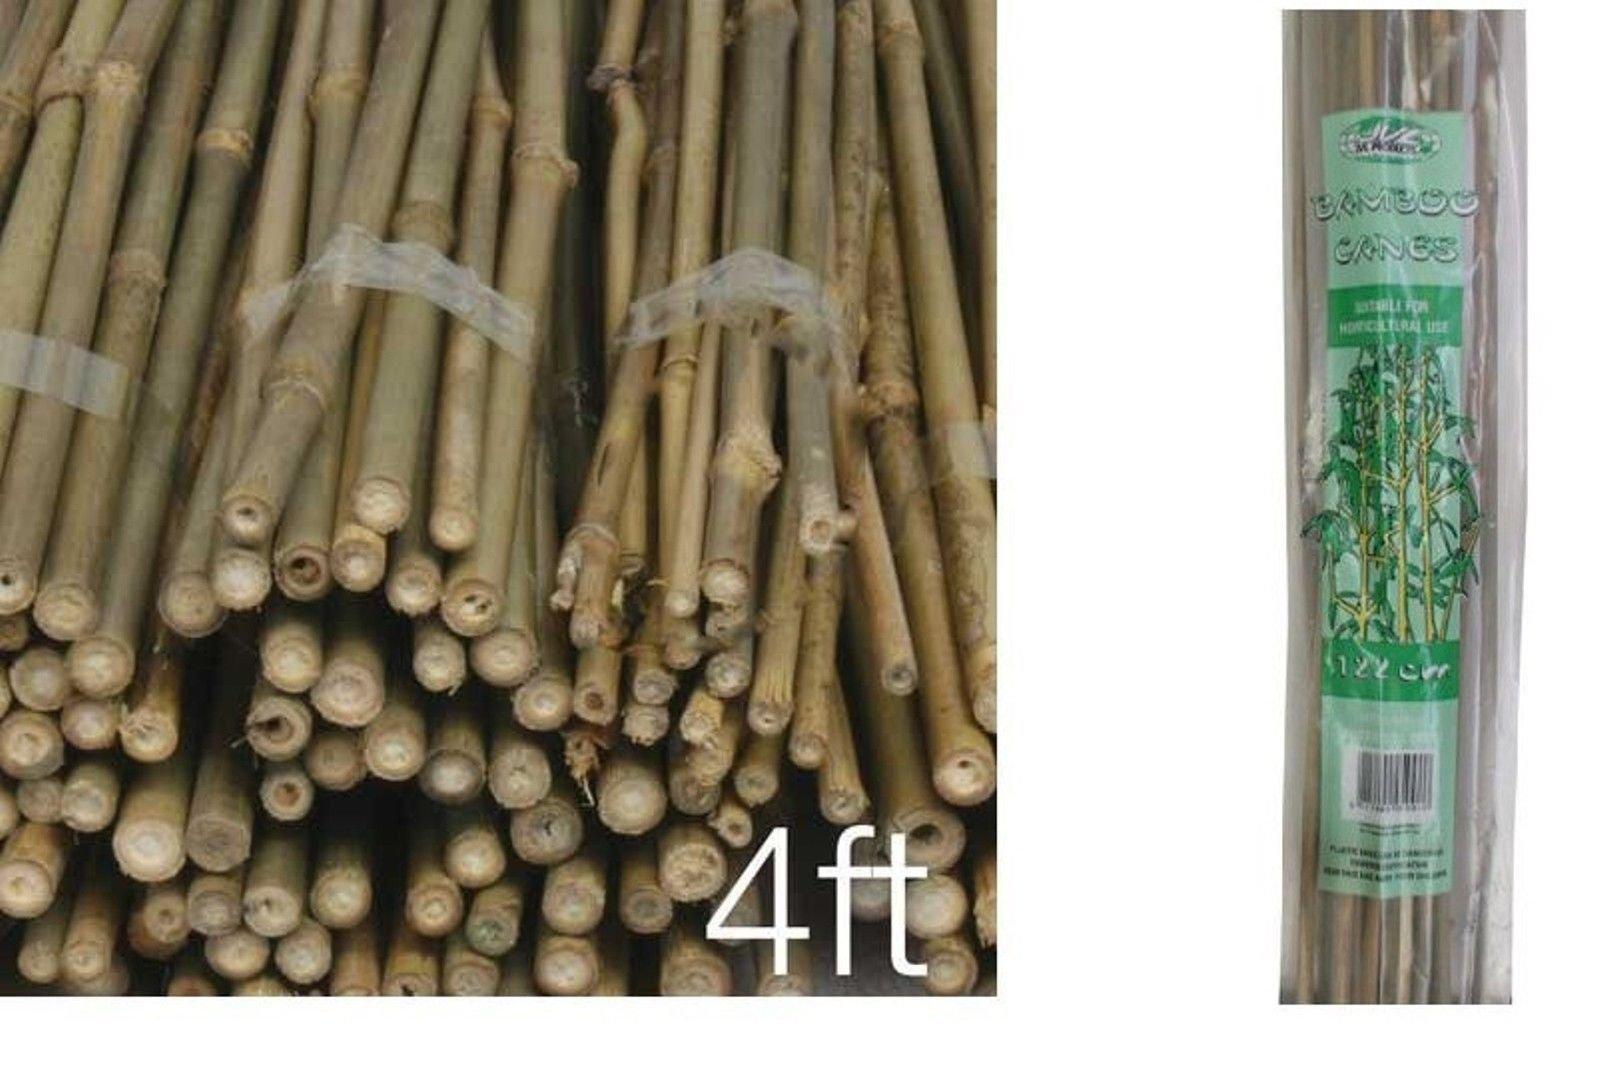 100 x cañas fuerte bambú natural bambú madera caña valla del jardín flor planta apoyo 4 feet- 120 cm: Amazon.es: Jardín